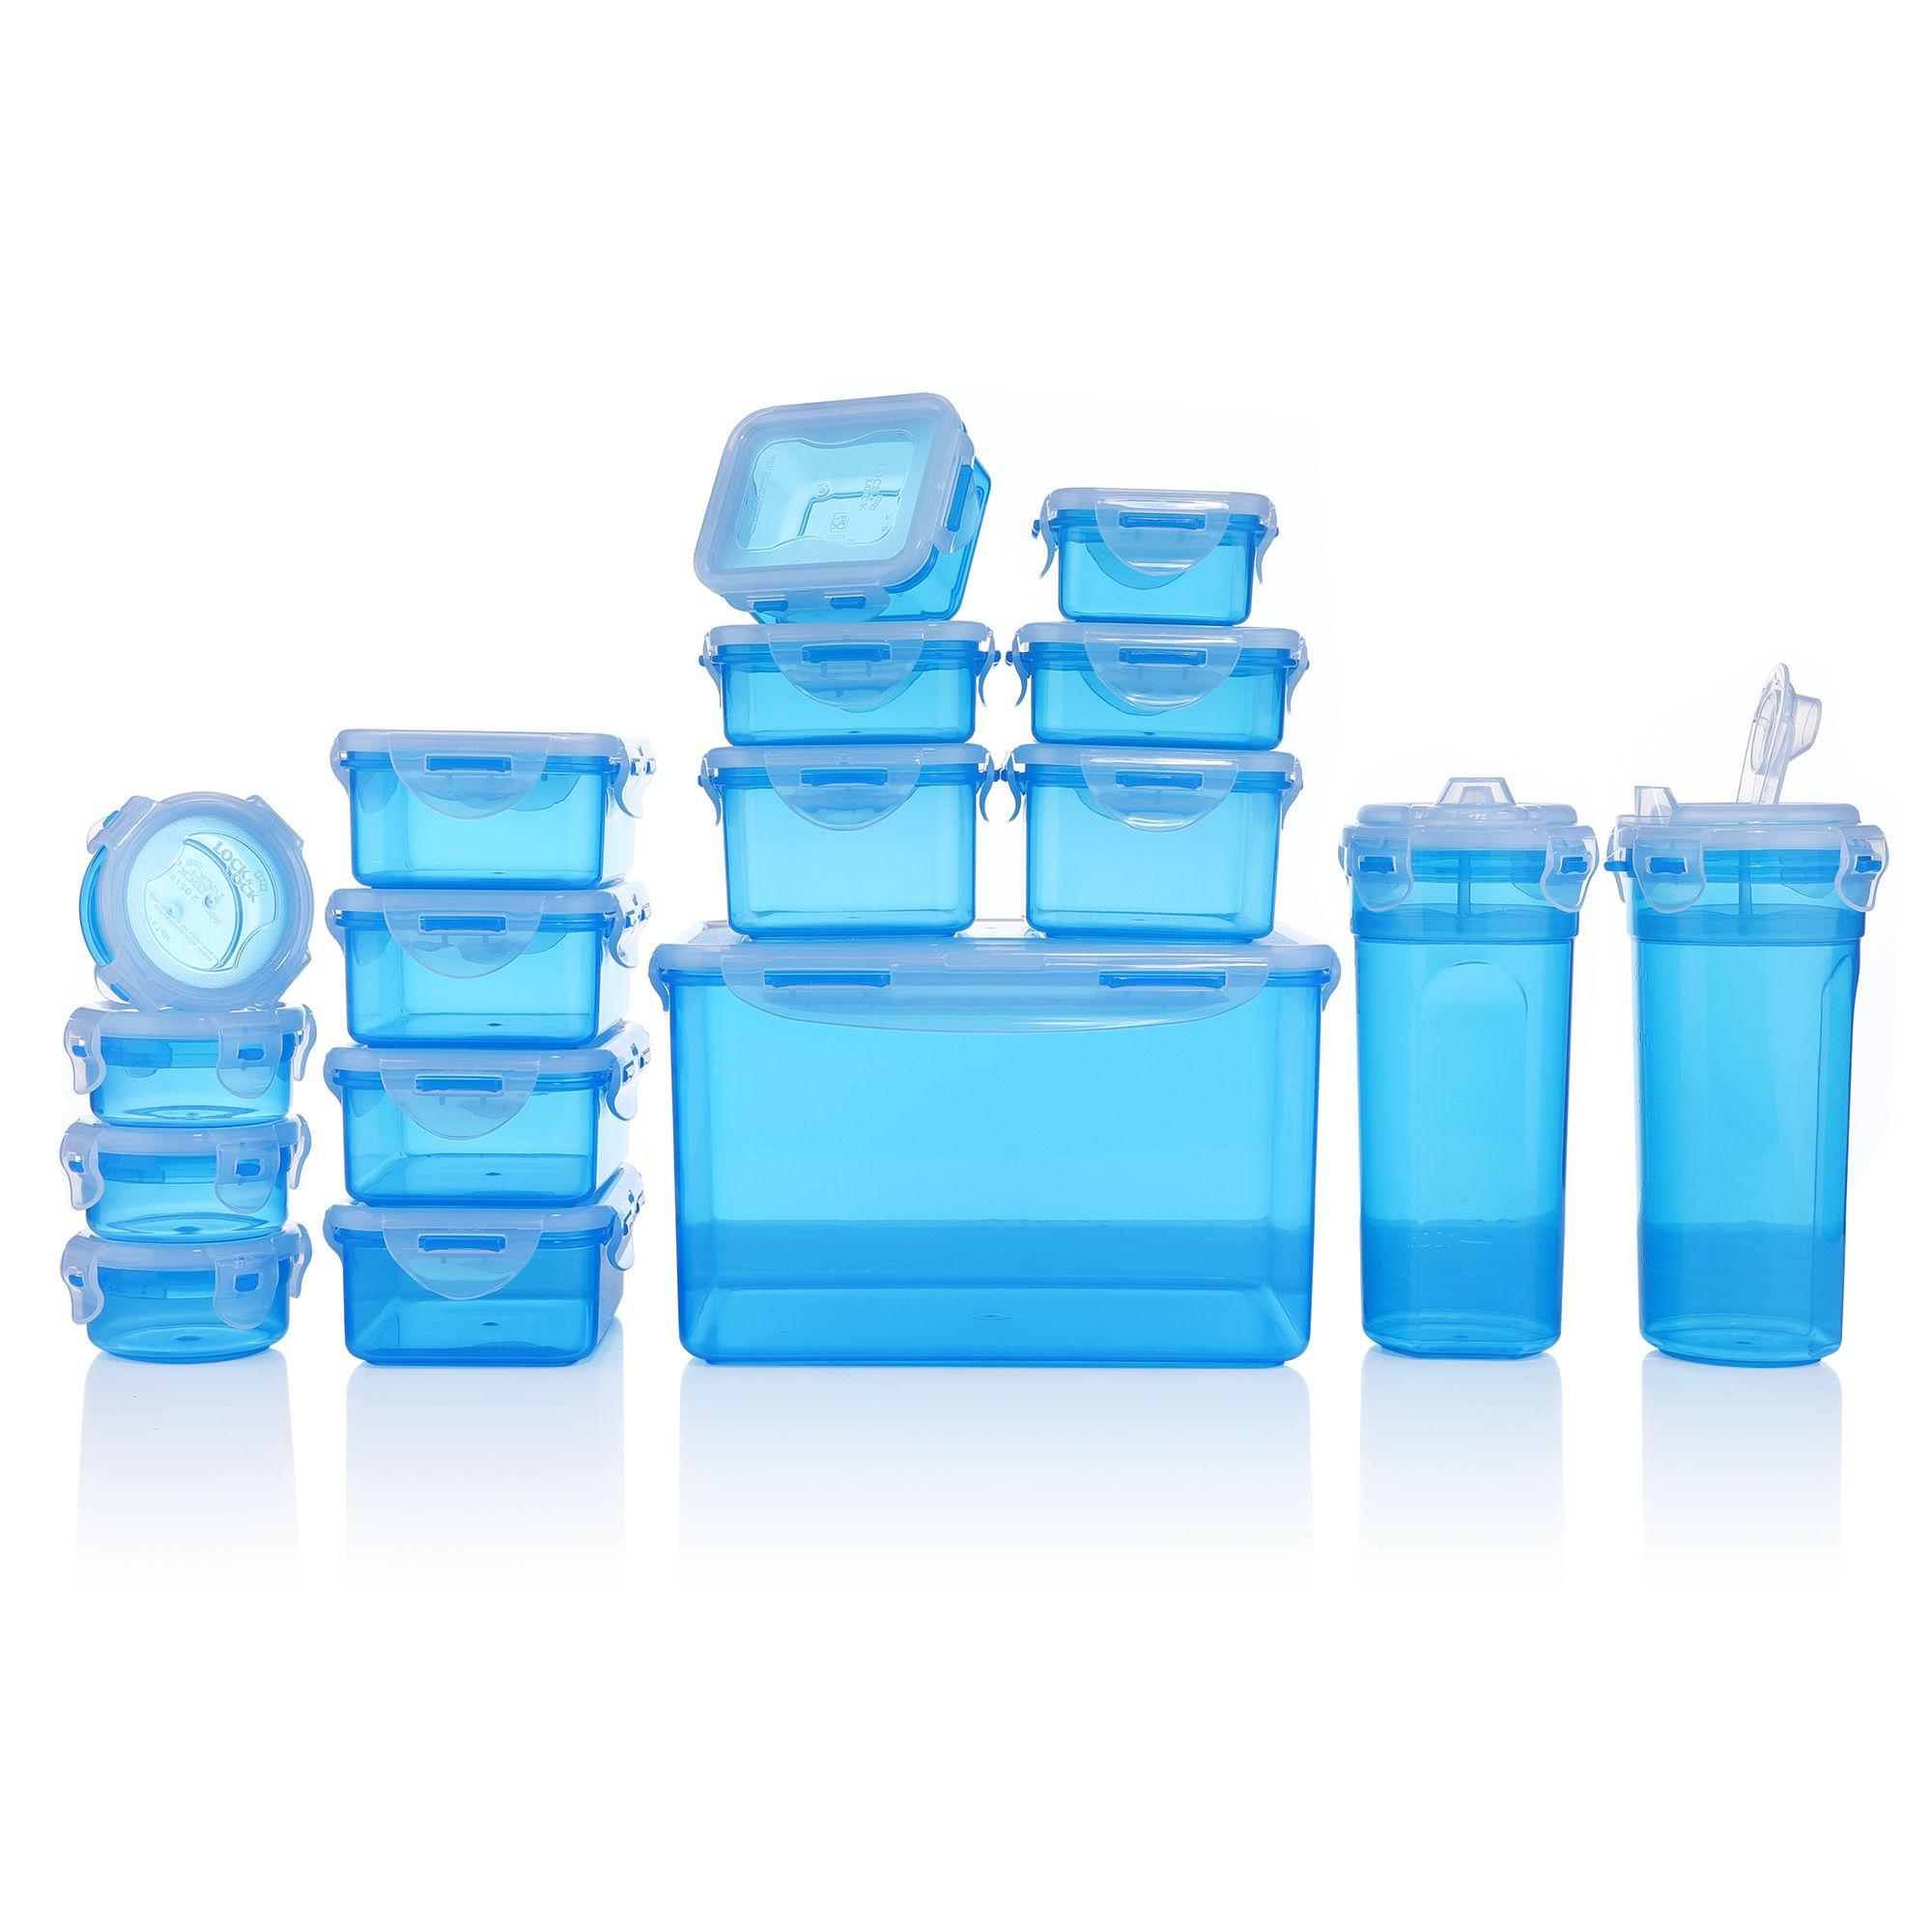 Lock & Lock Frischhaltedosen 15er Pack (100ml bis 4,5 Liter) + 2 Shaker ab 14,48€ (statt 29€)